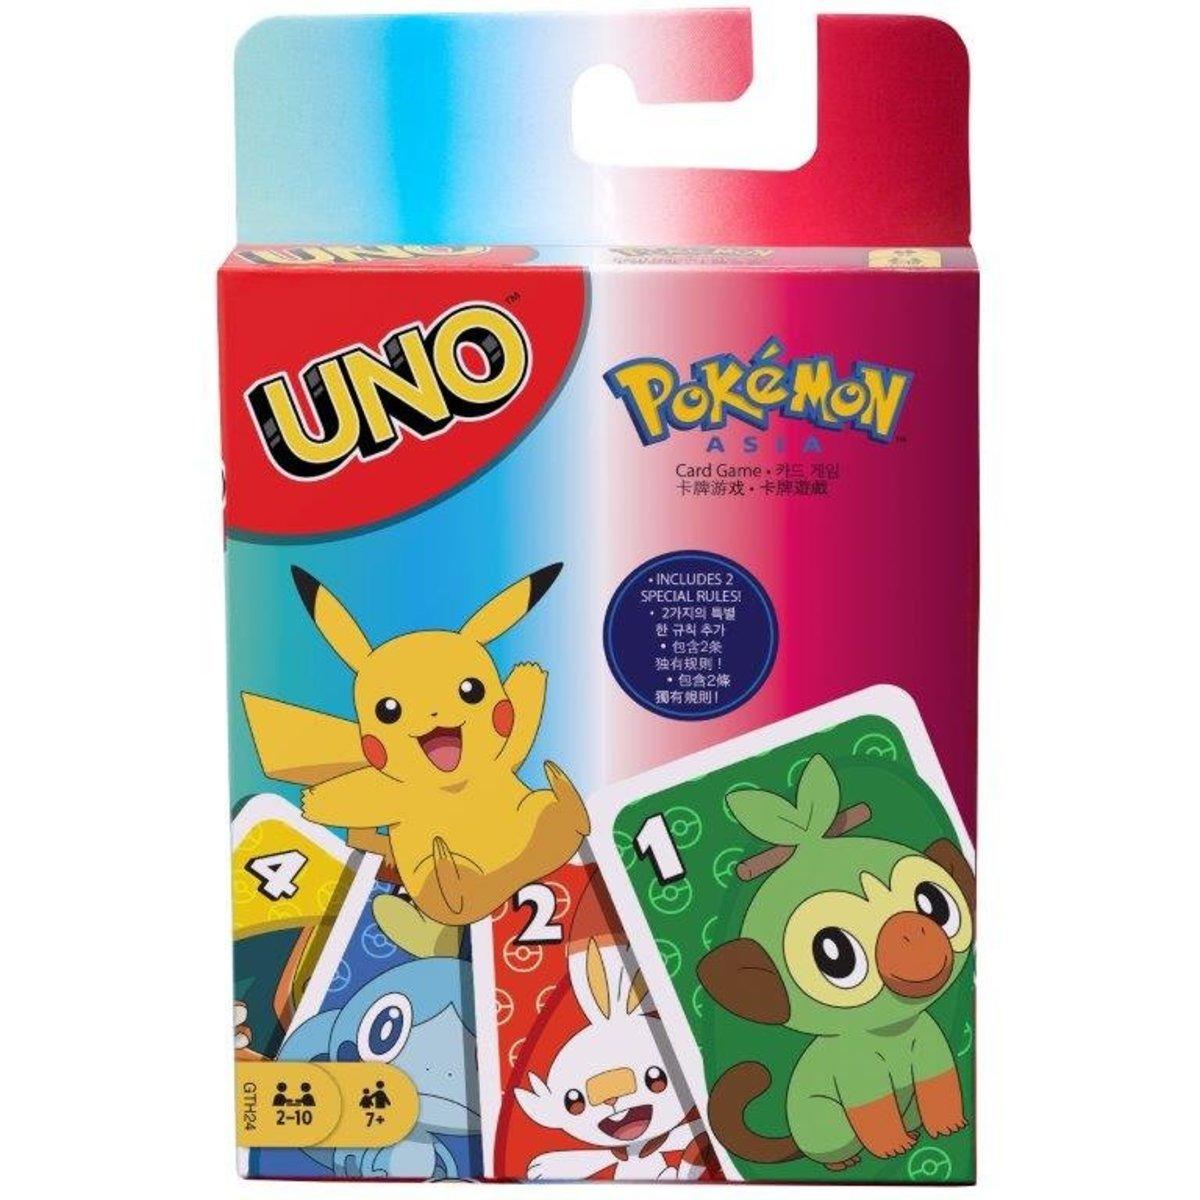 UNO Card Game (Pokemon) English Version